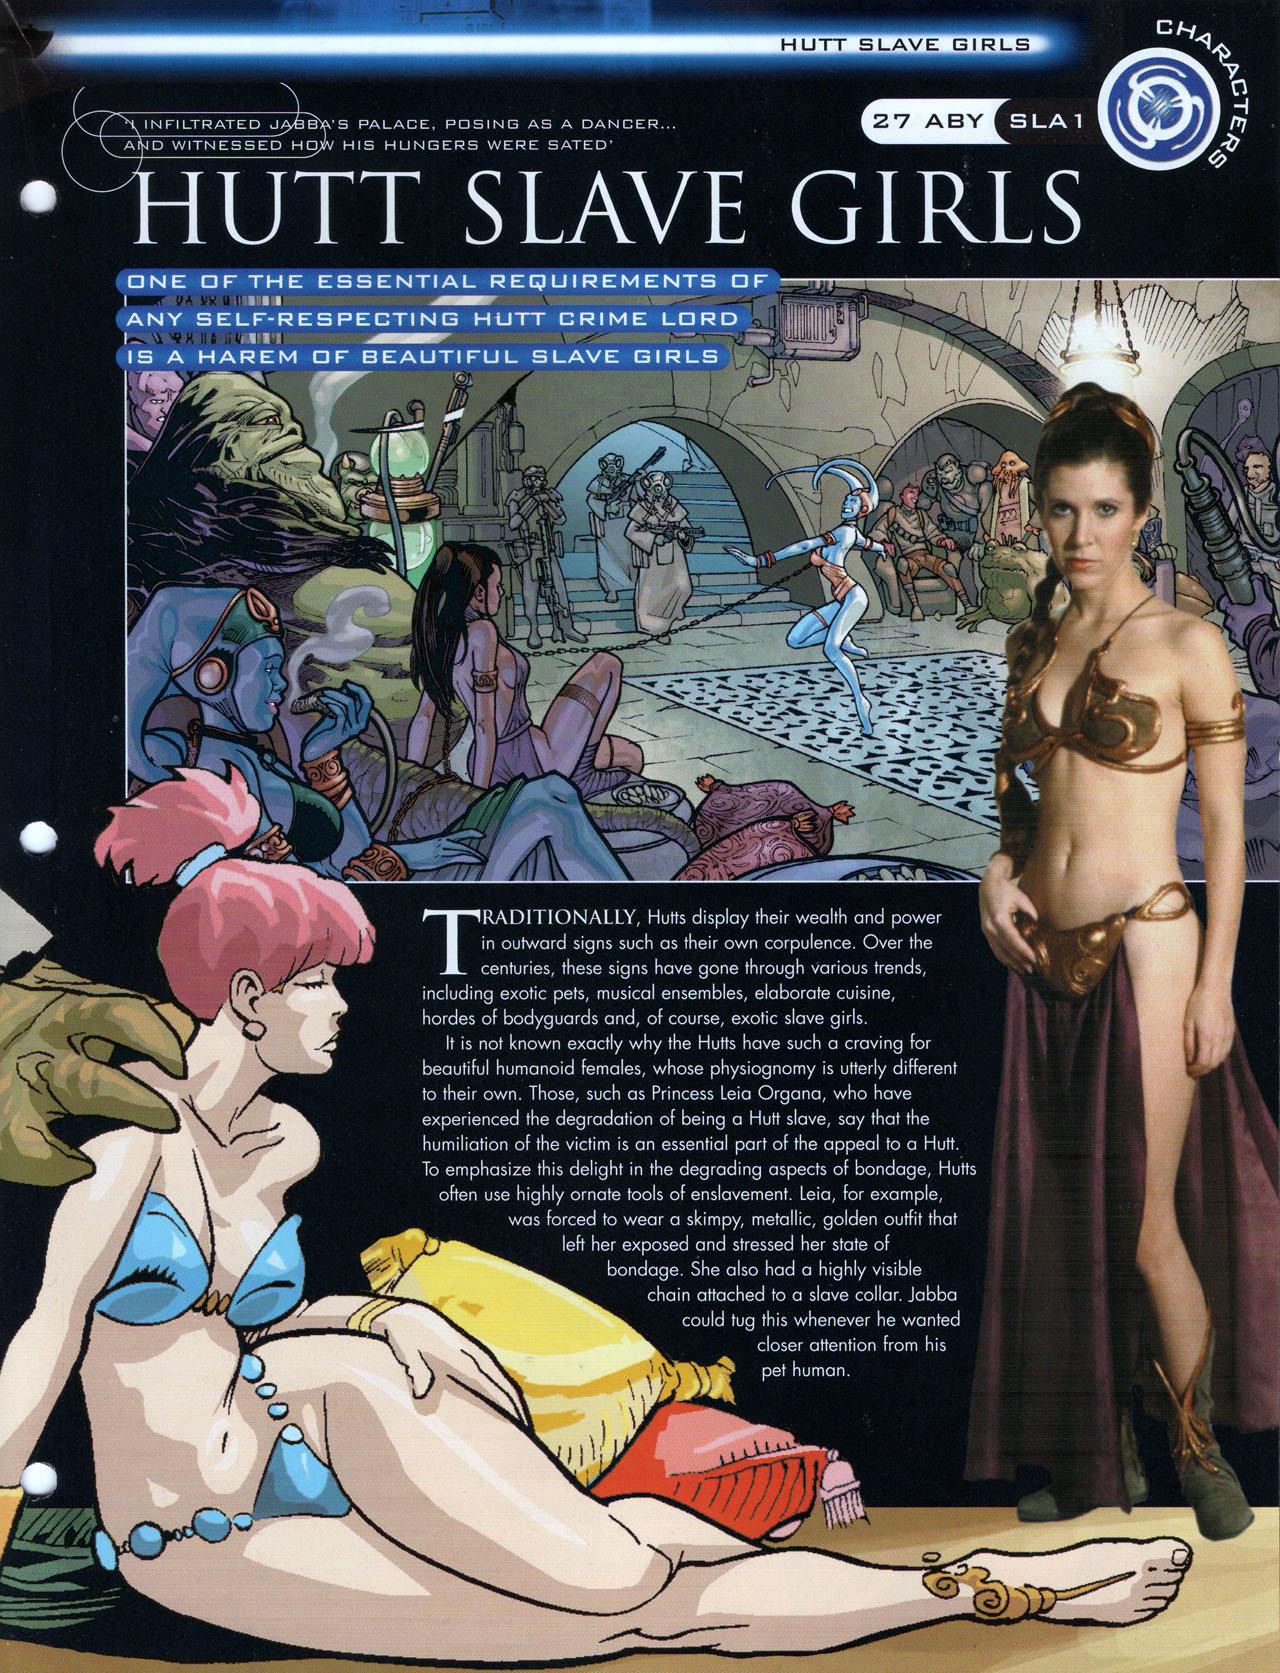 Hutt Slave Girls, p. 1